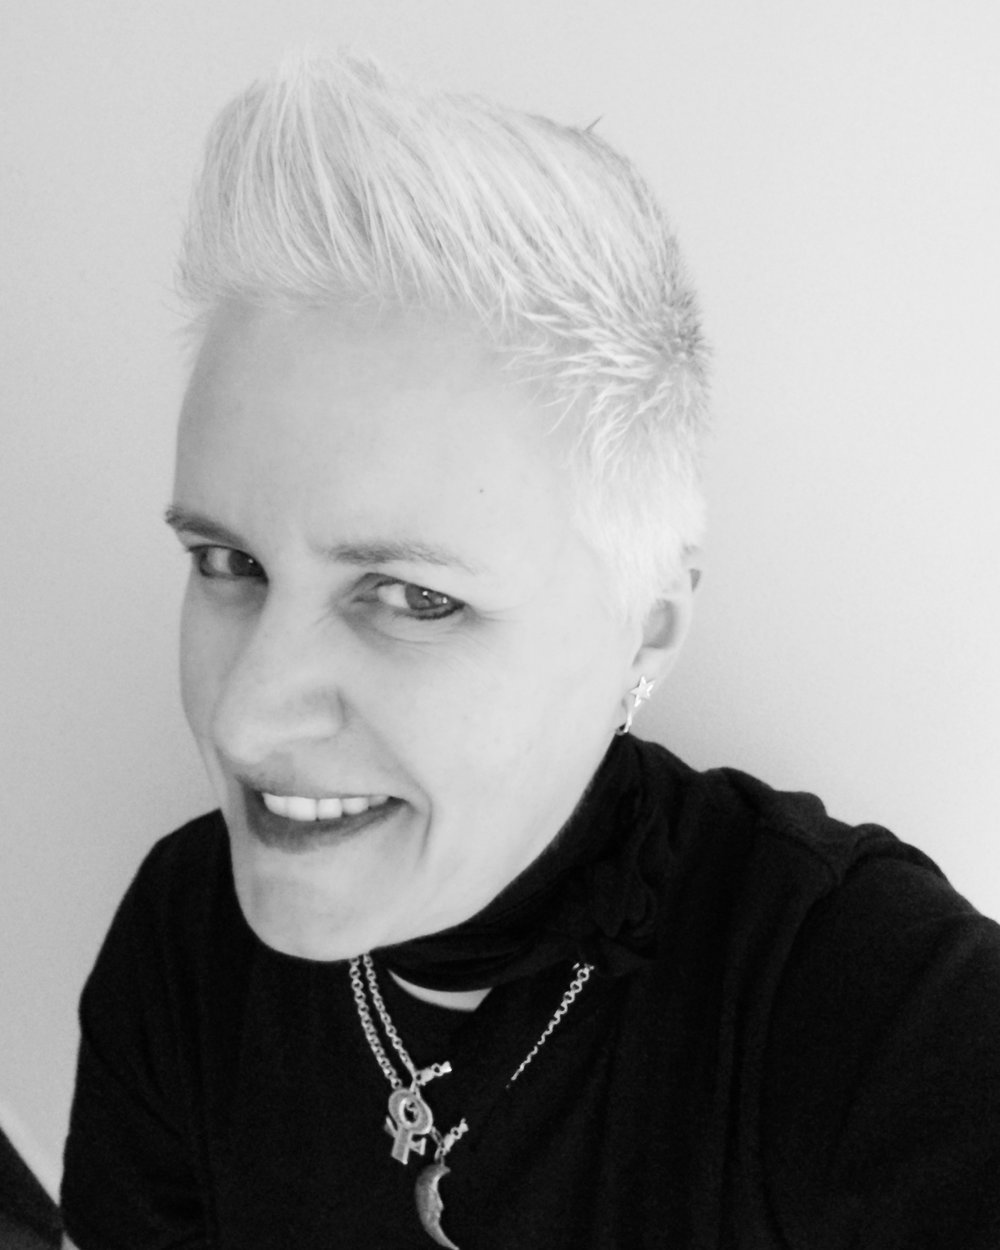 Danielle Frederick Artist - Born 1966 in Quakertown, Pennsylvania      Artist - Drafts Woman - Illustrator - Painter - Environmentalist